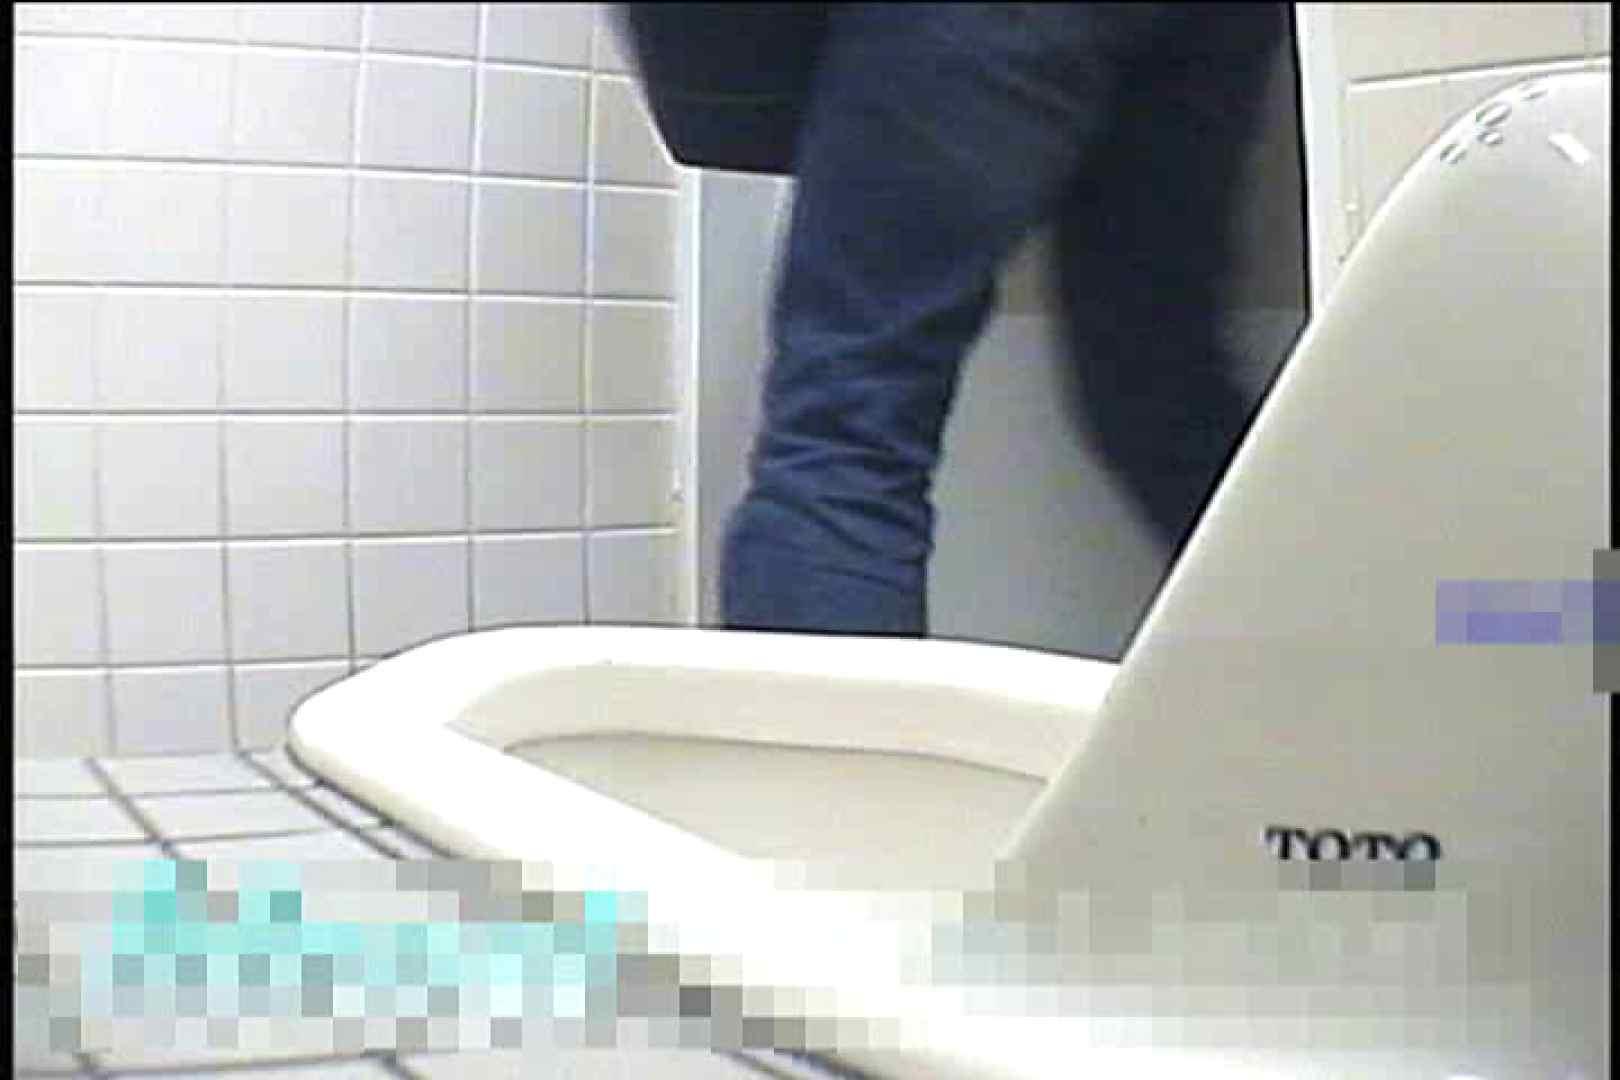 2点盗撮洗面所潜入レポートVol.4 下半身 | 熟女エロ画像  36PICs 31